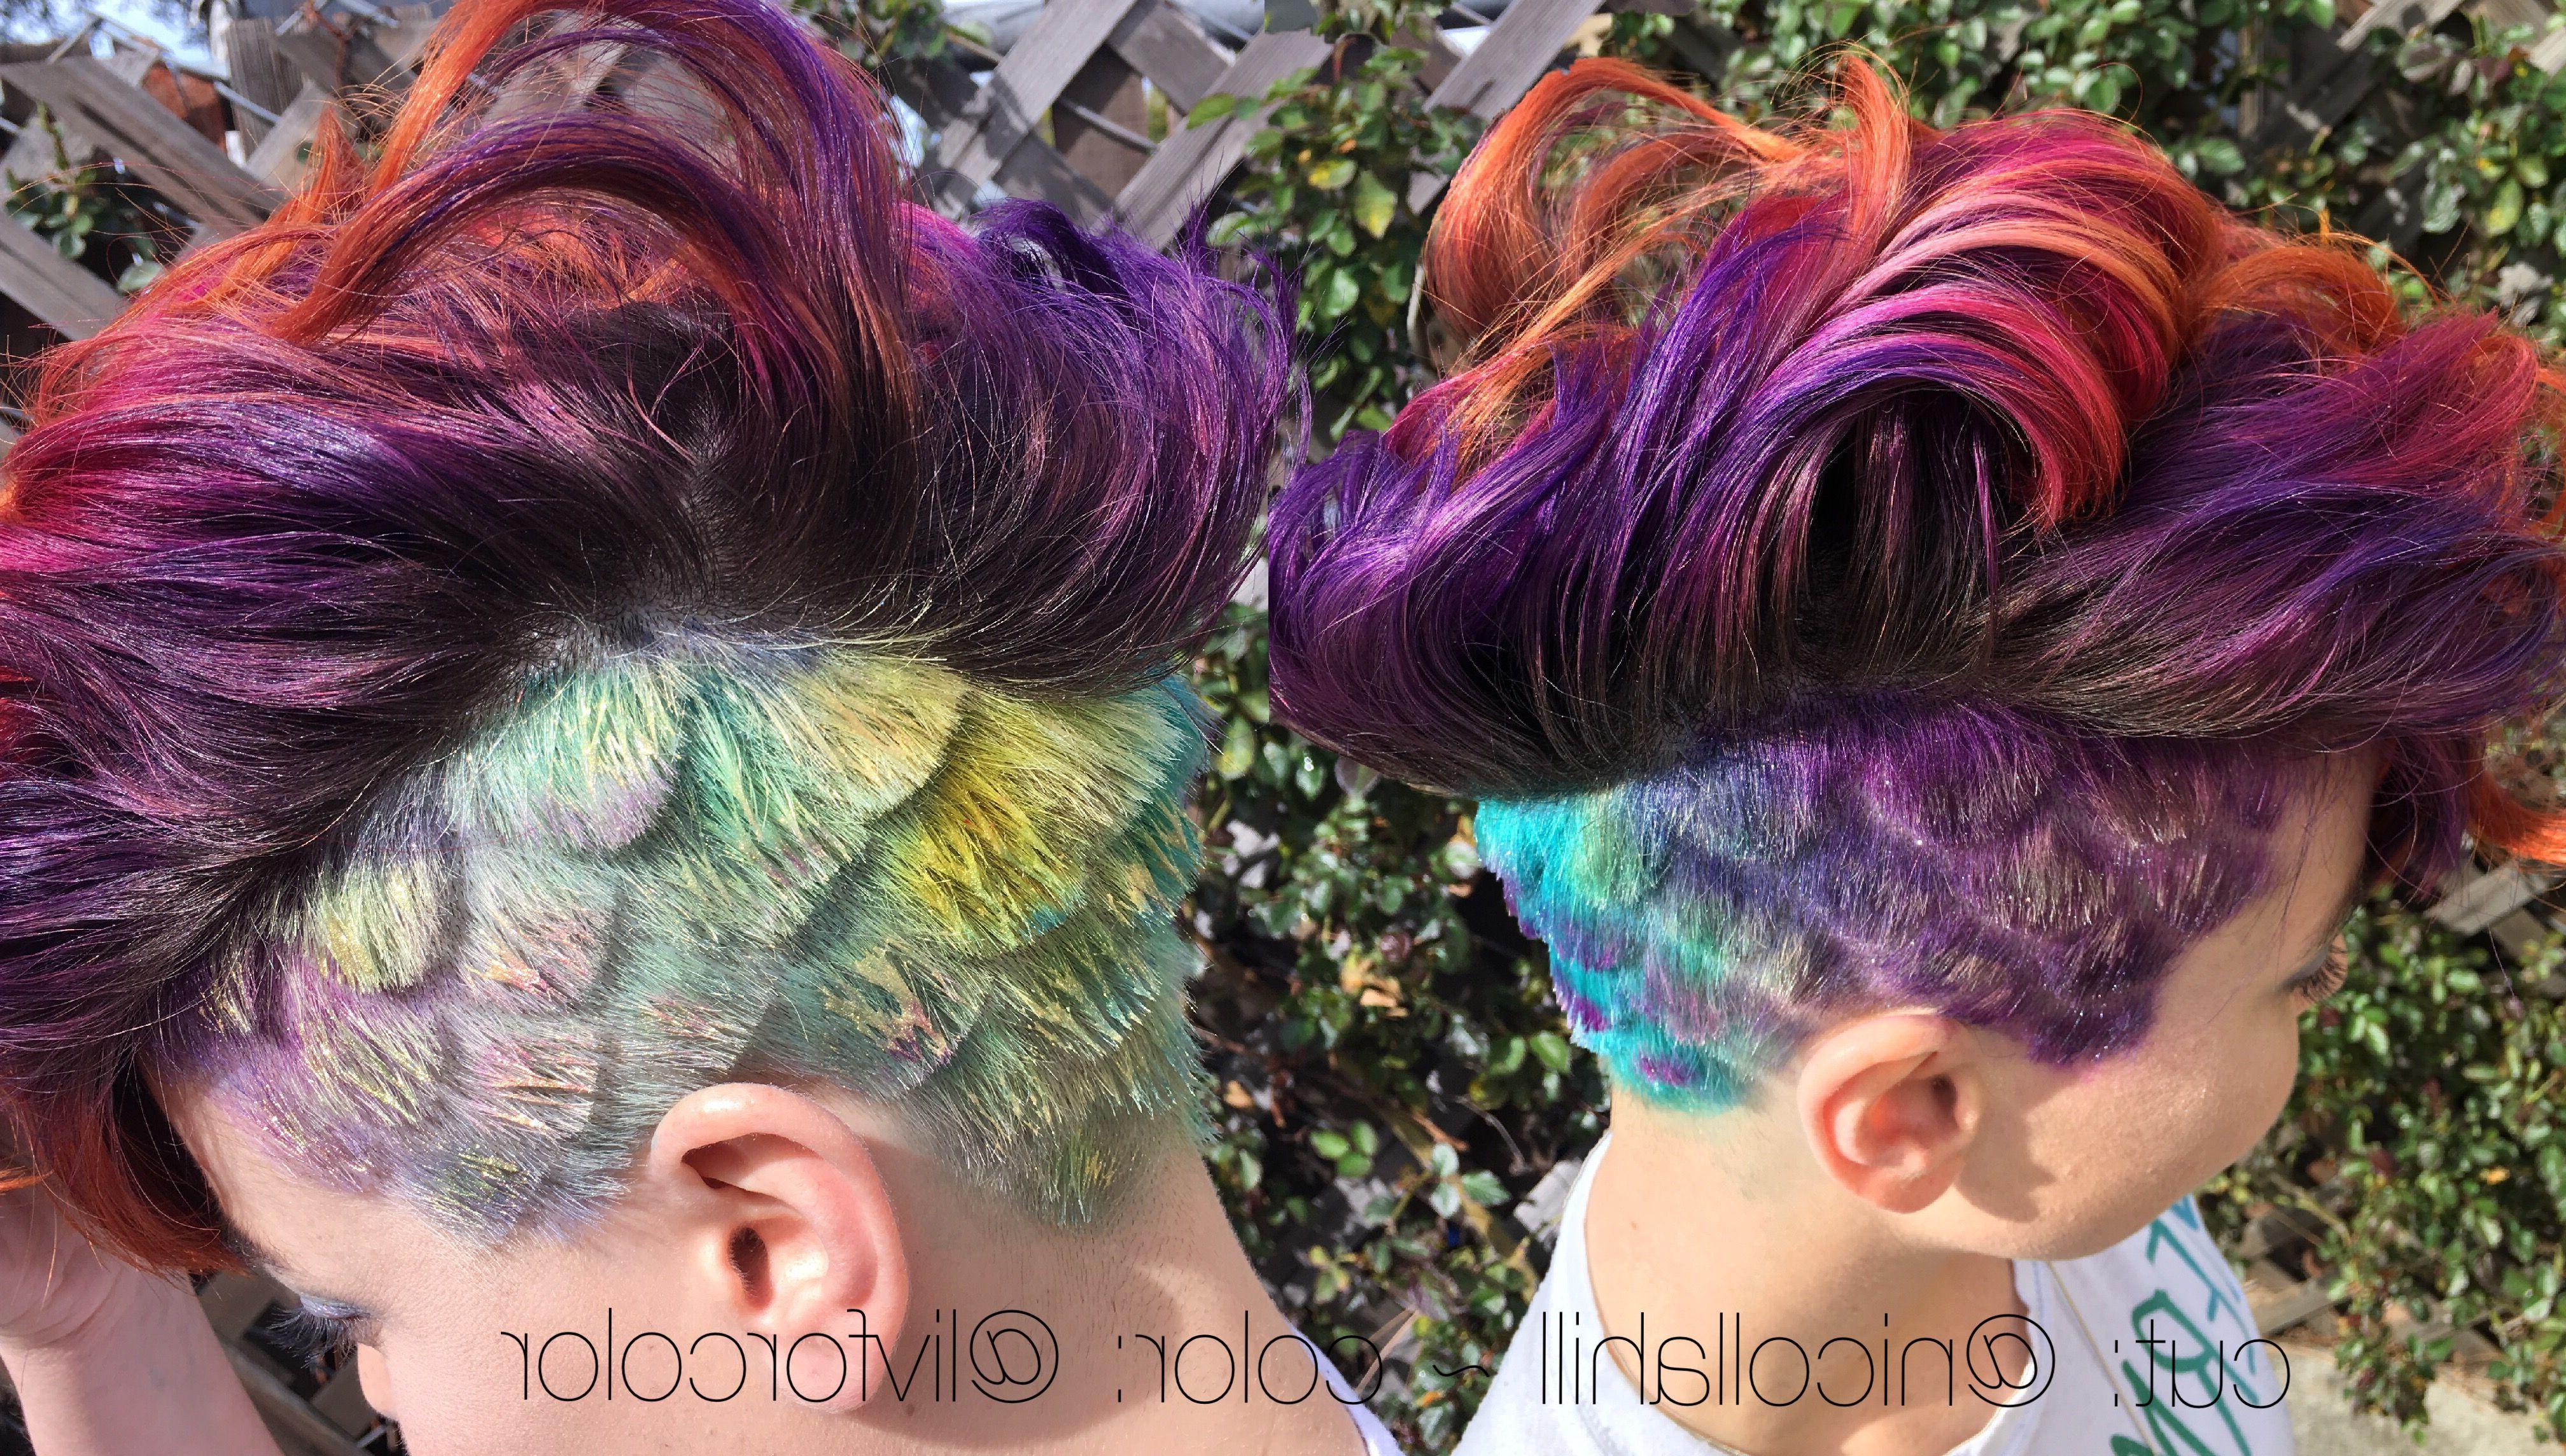 Mermaid Hair Mohawk Undercut Scales Rainbow Purple Hair Orange Hair Regarding Newest Rainbow Bright Mohawk Hairstyles (View 11 of 20)